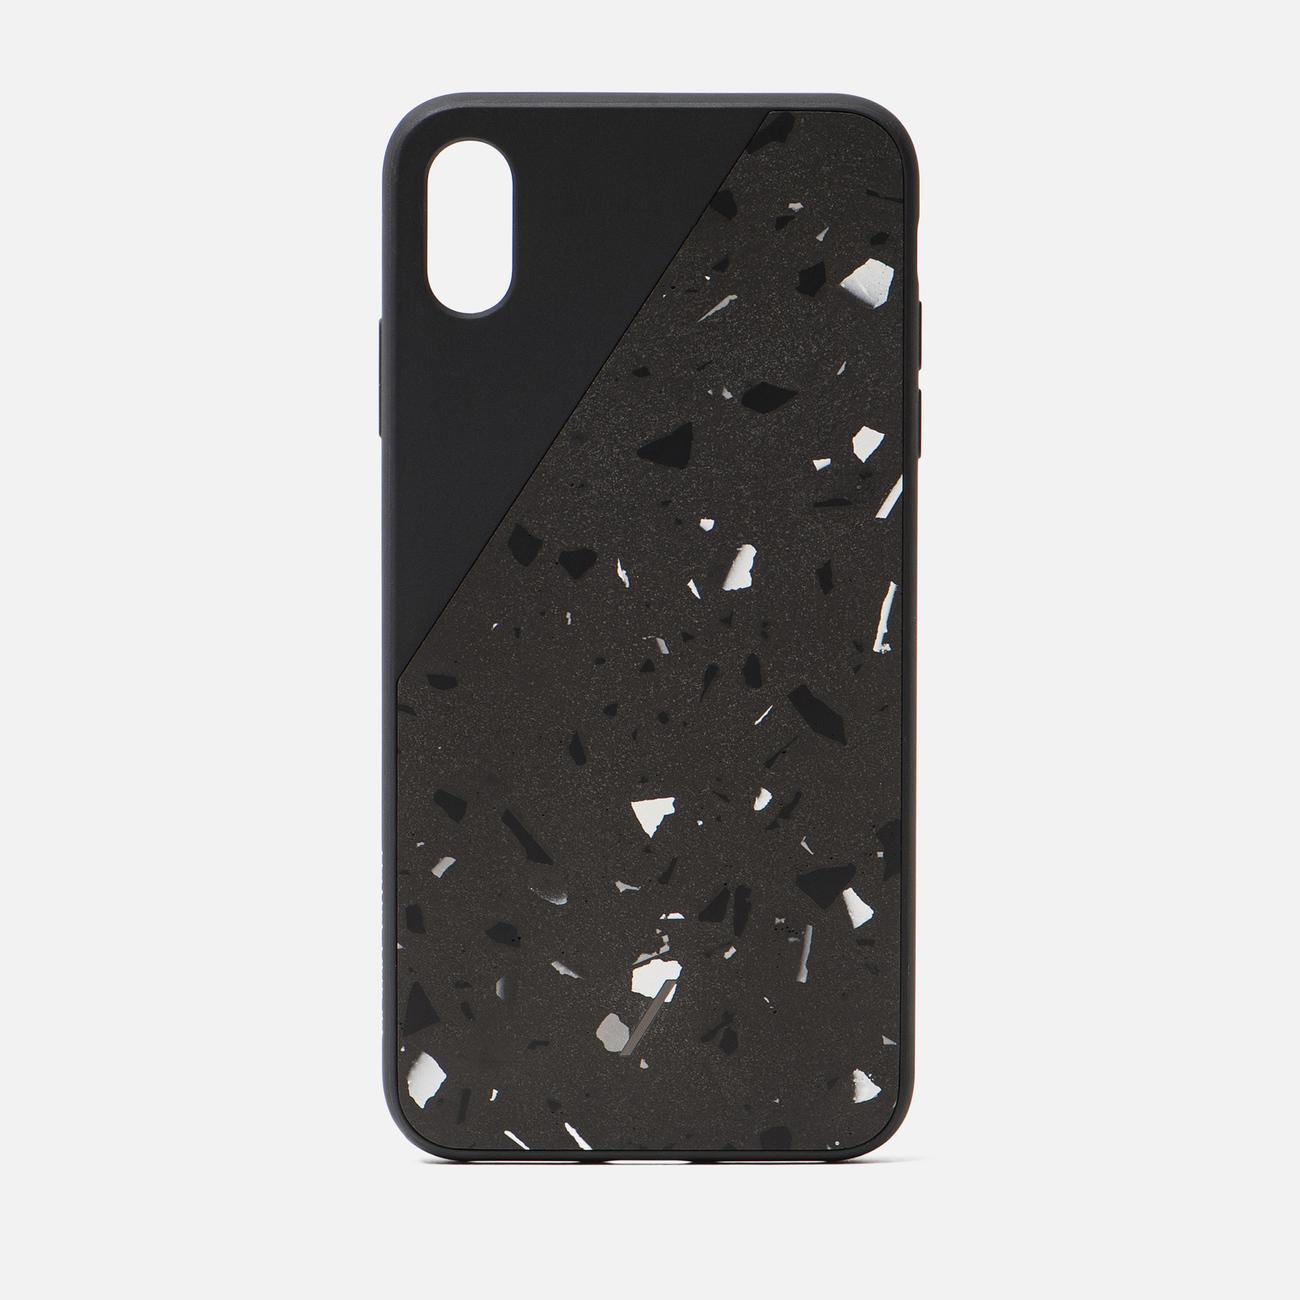 Чехол Native Union Clic Terrazzo iPhone Xs Max Black